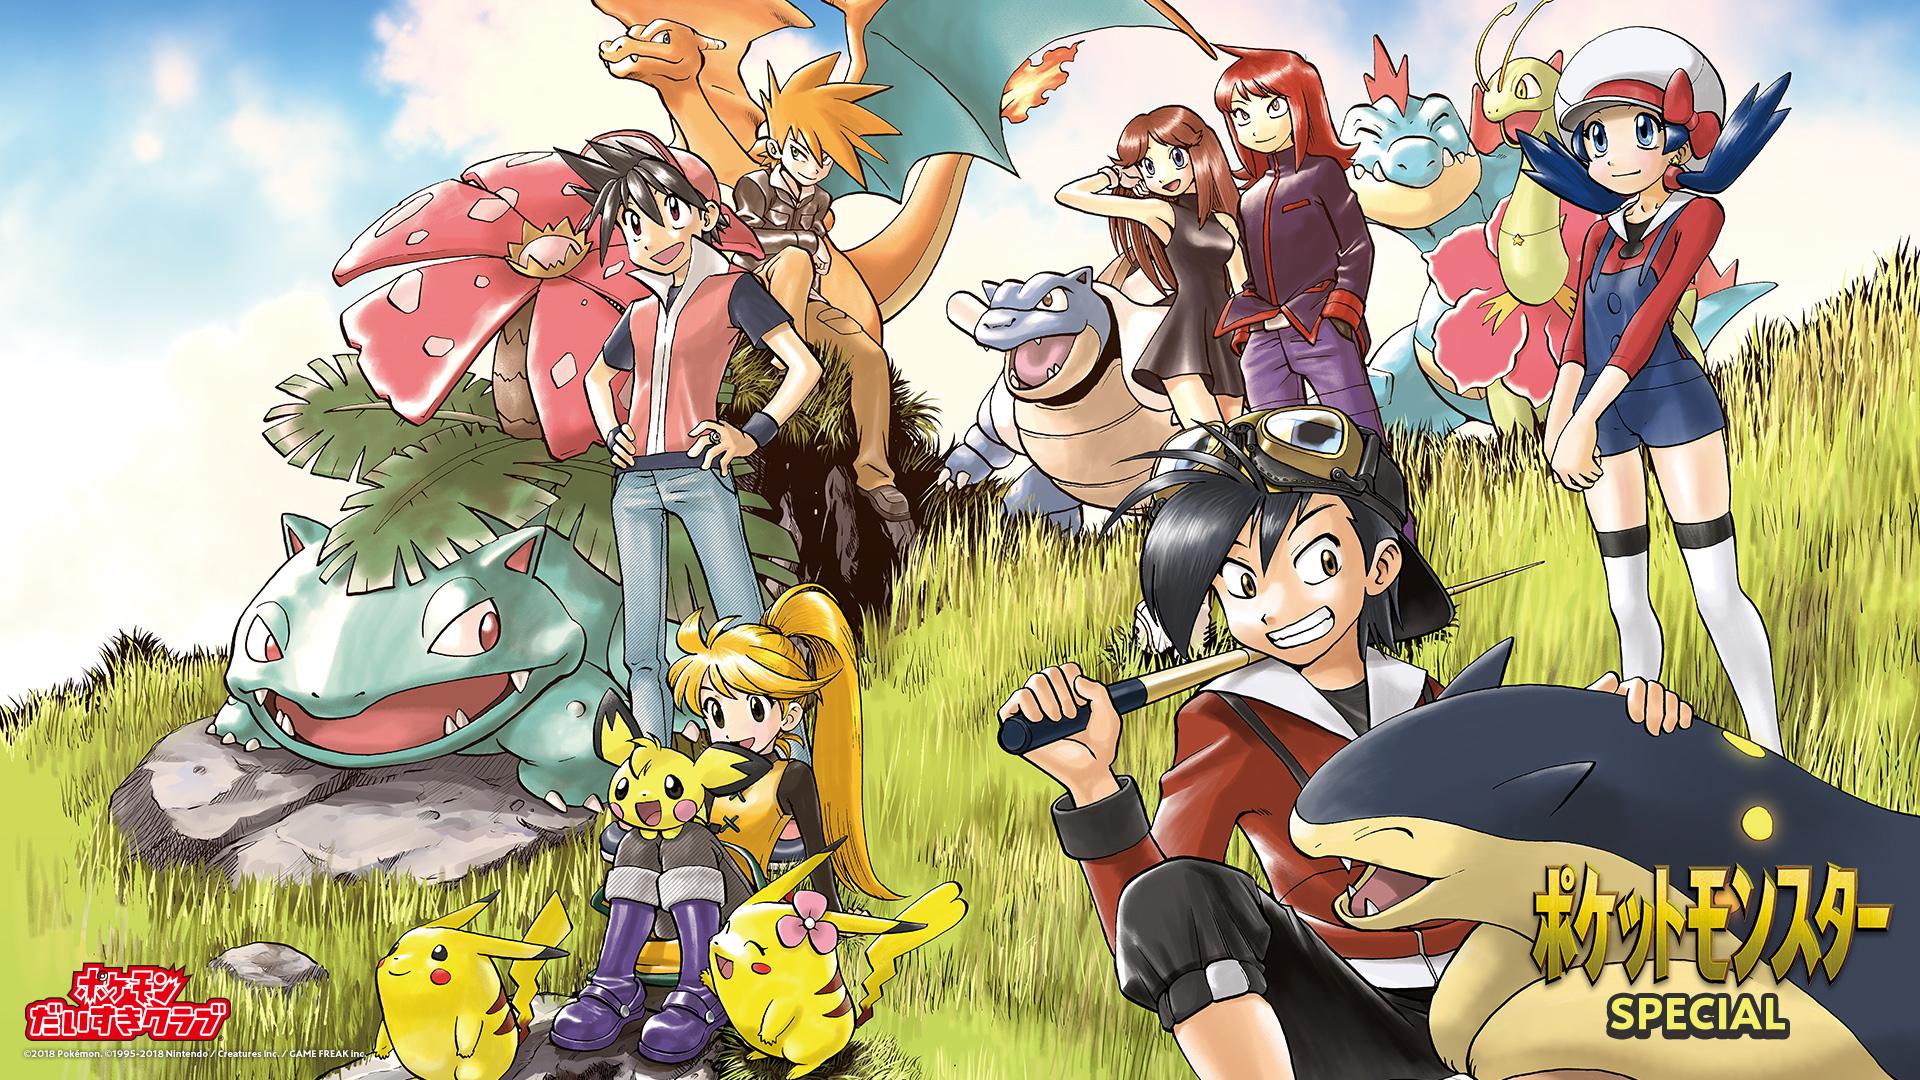 Pocket Monsters SPECIAL artwork commemorativo Pokémon Daisuki Club Johto World